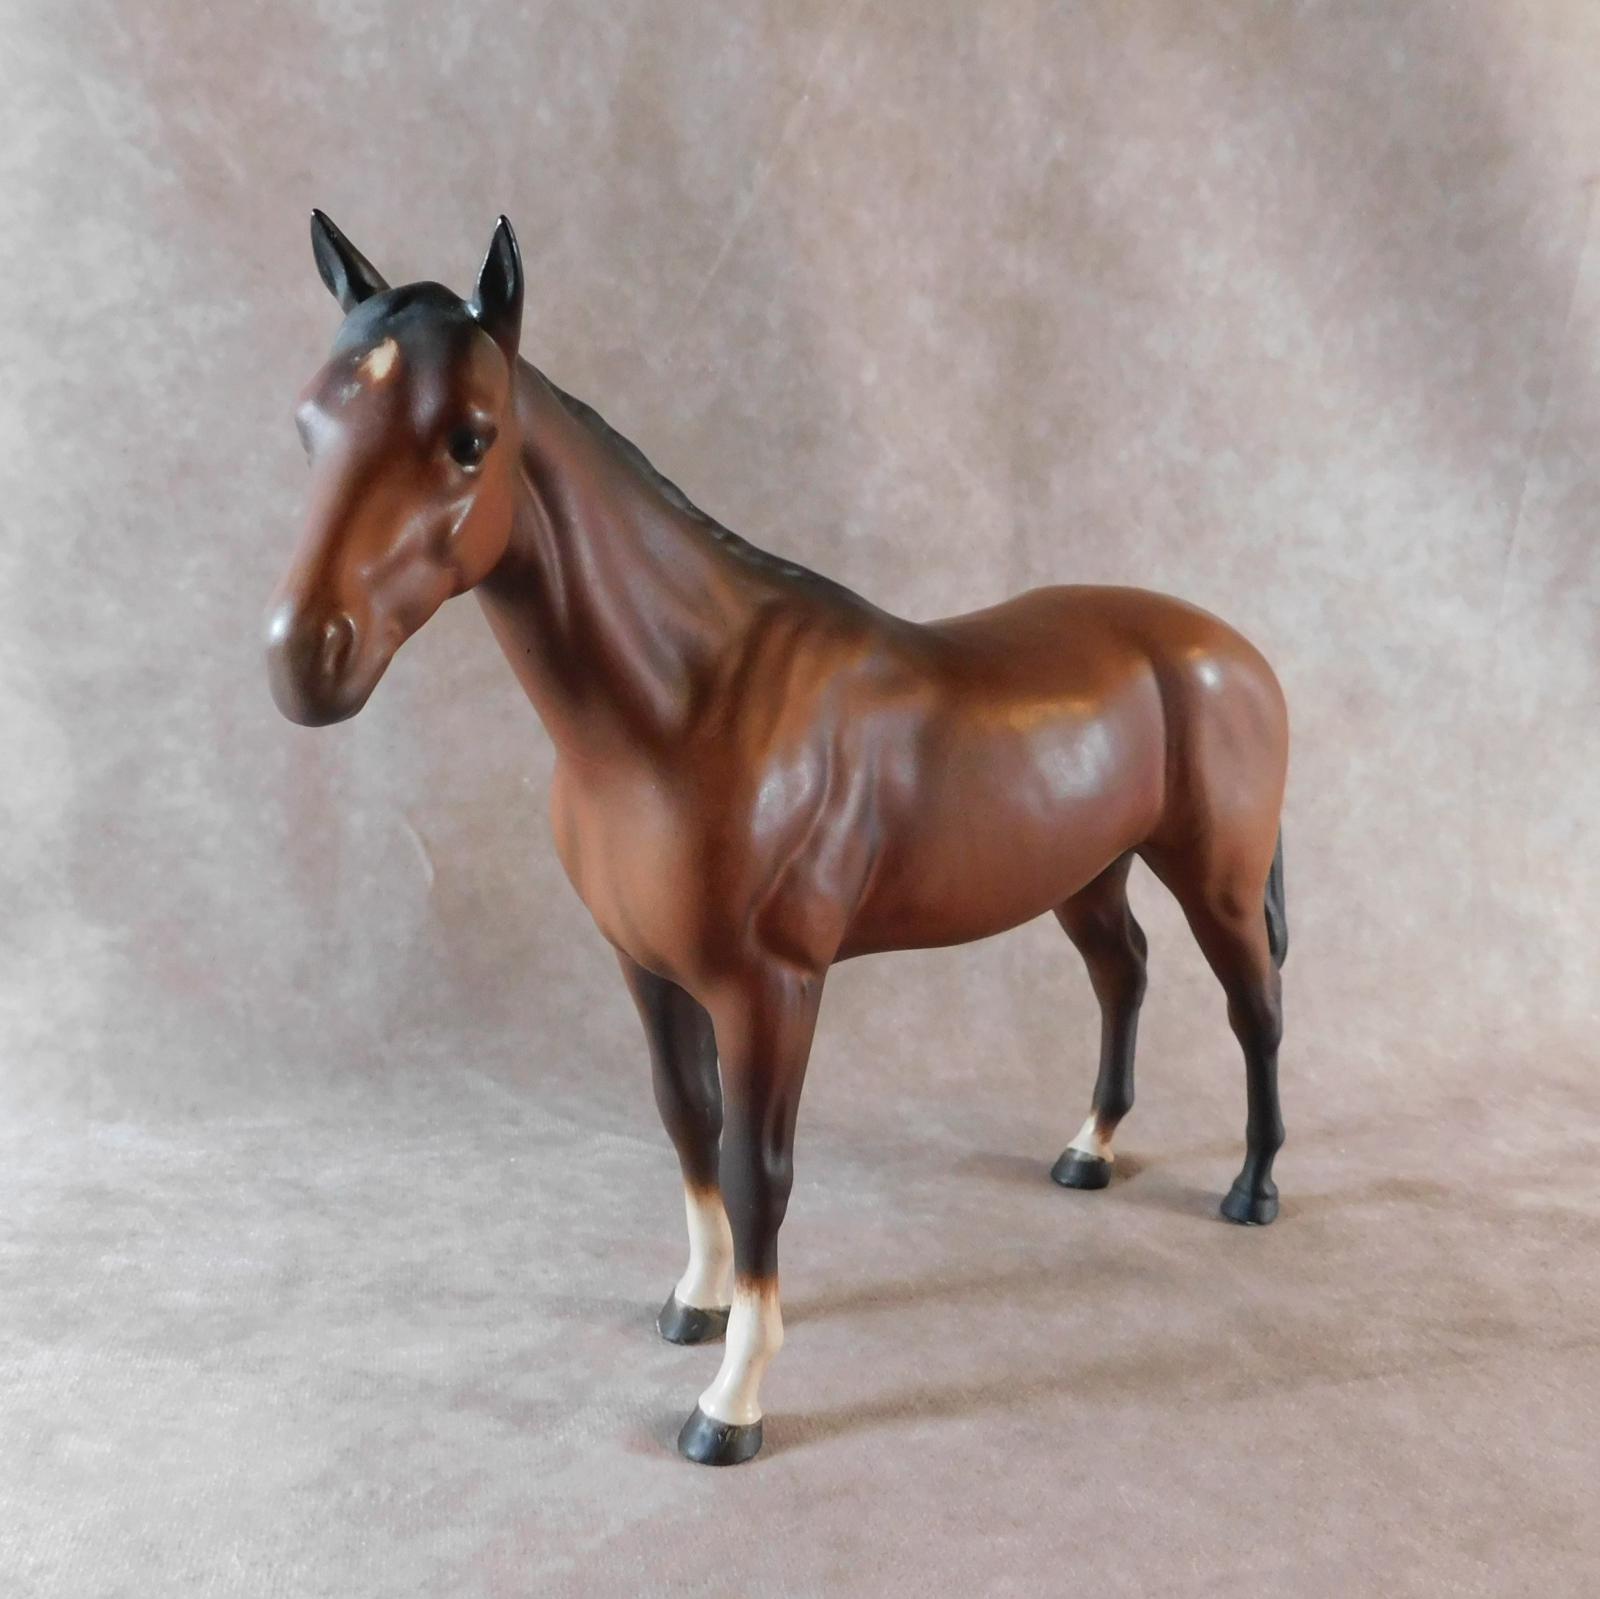 Beswick Thoroughbred Stallion Model Number 1772 (1 of 1)